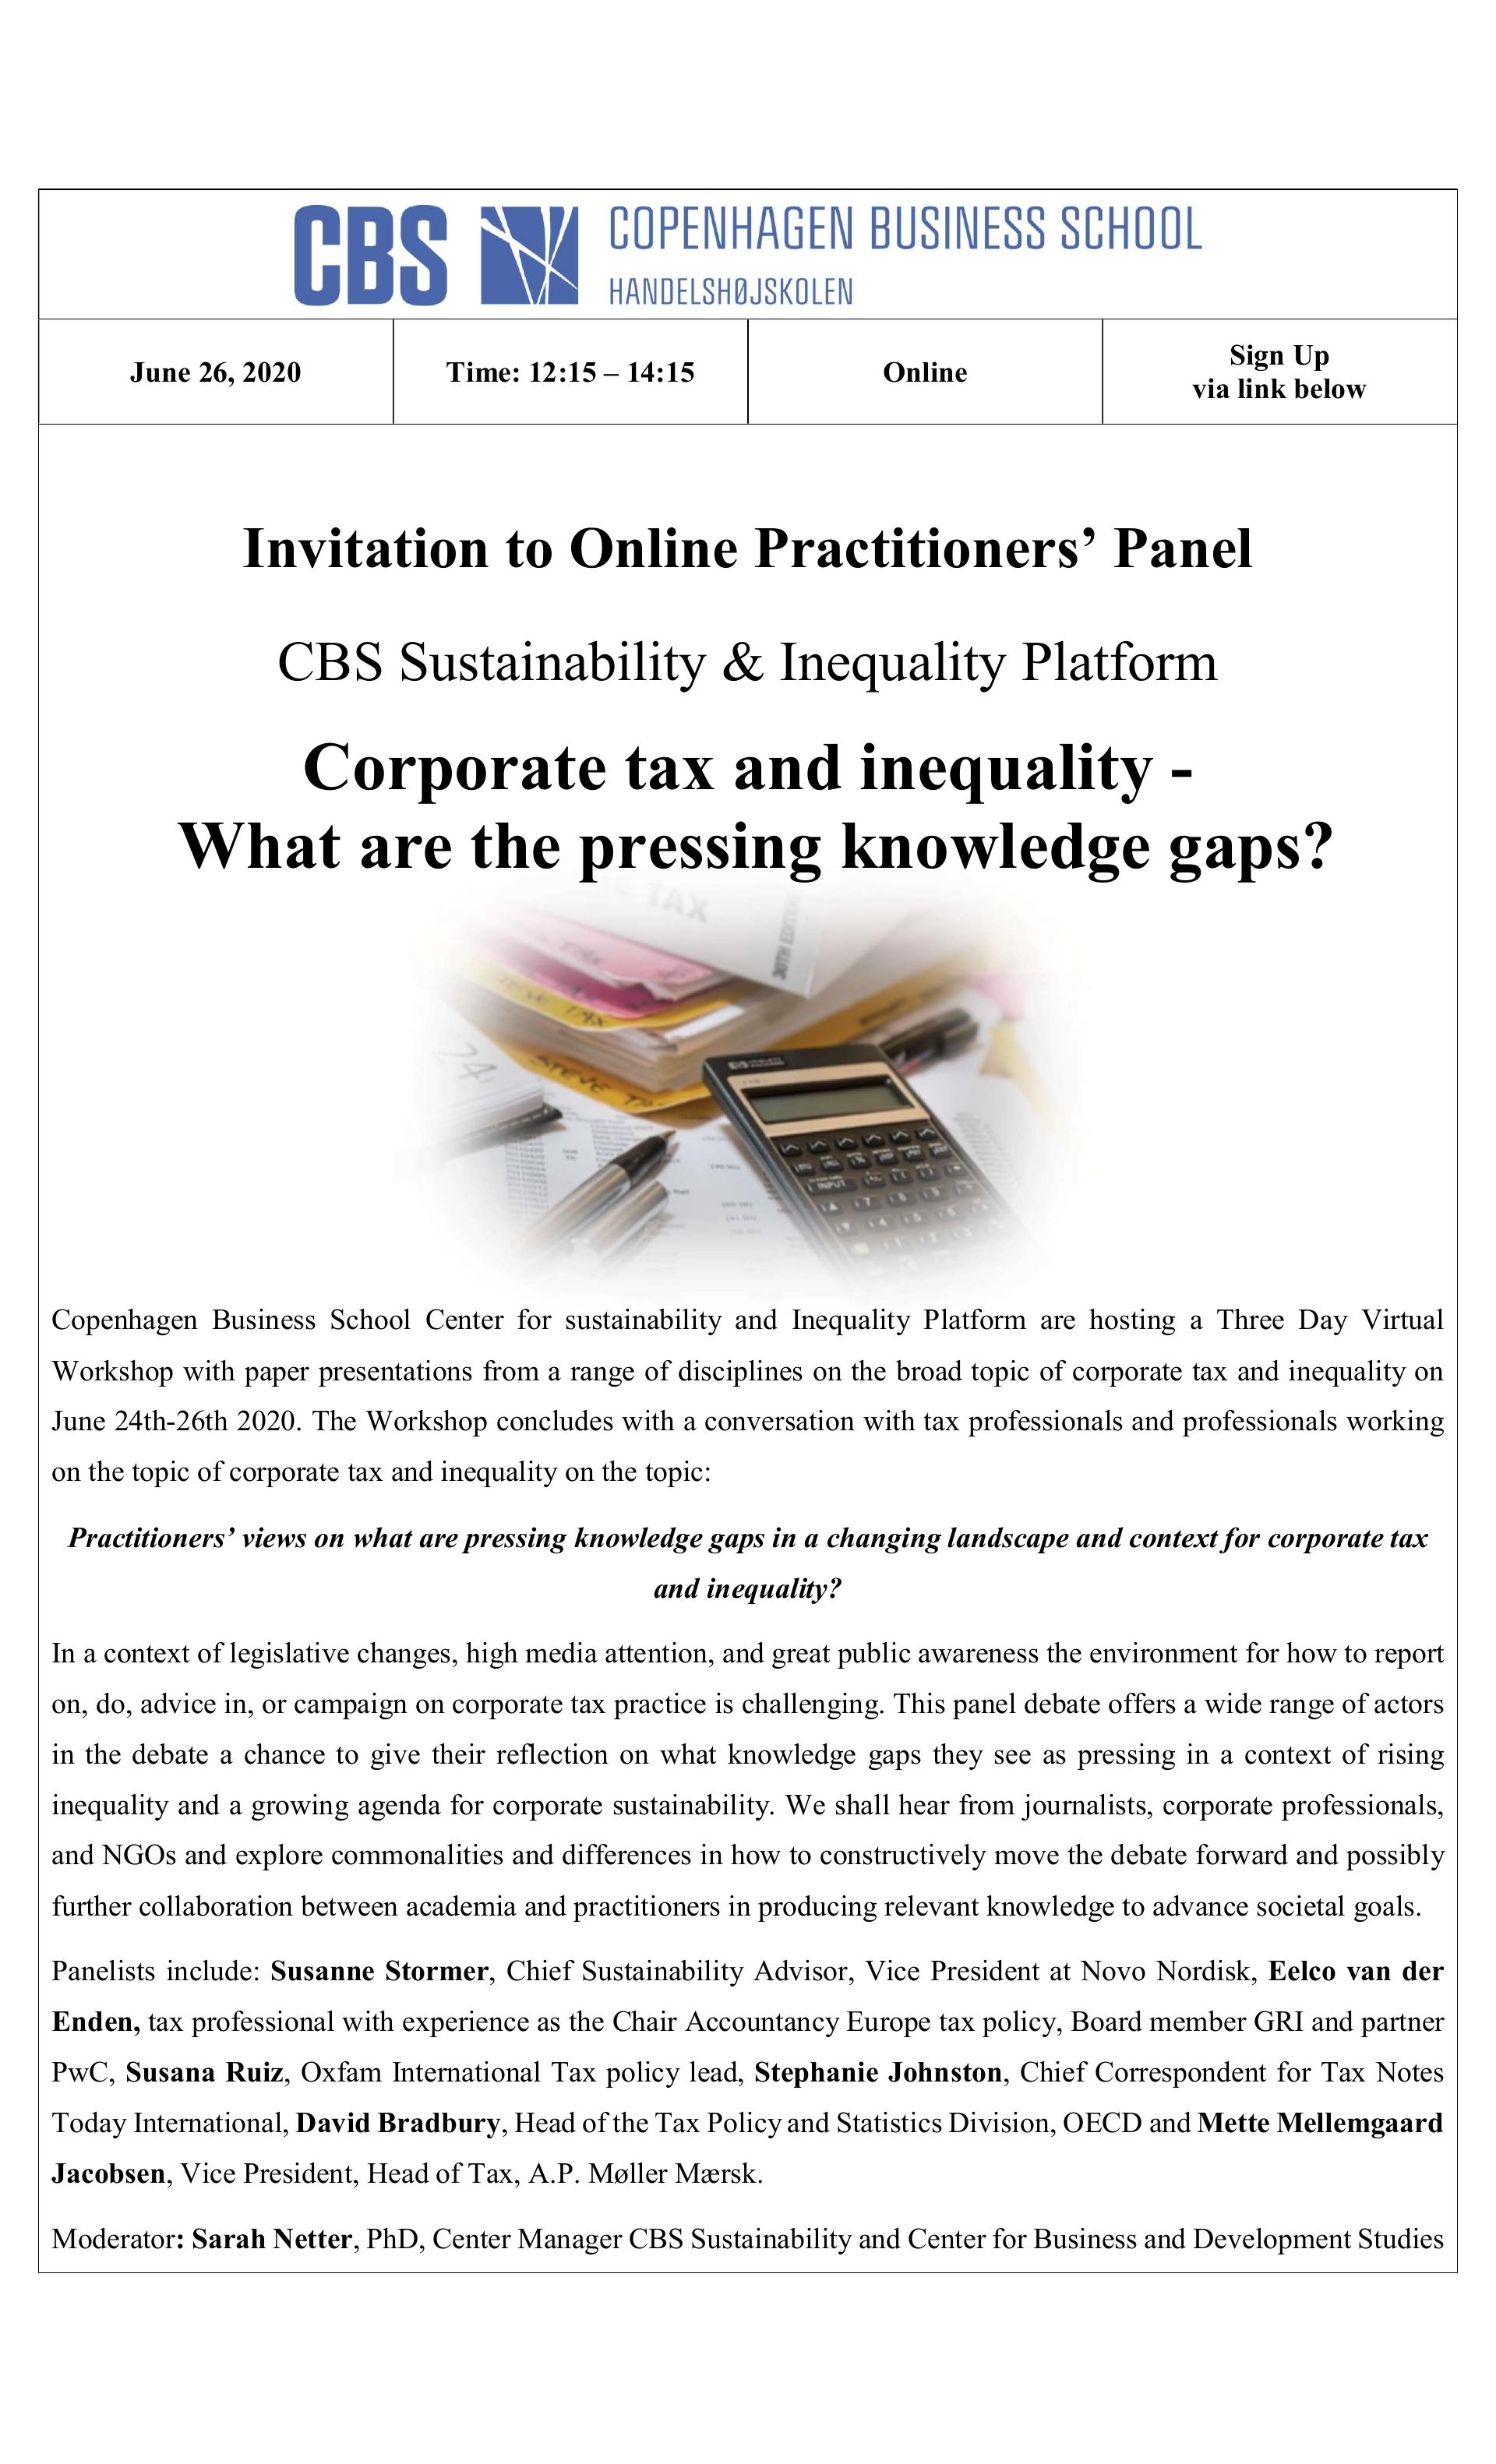 Practitioners' Panel Invitation